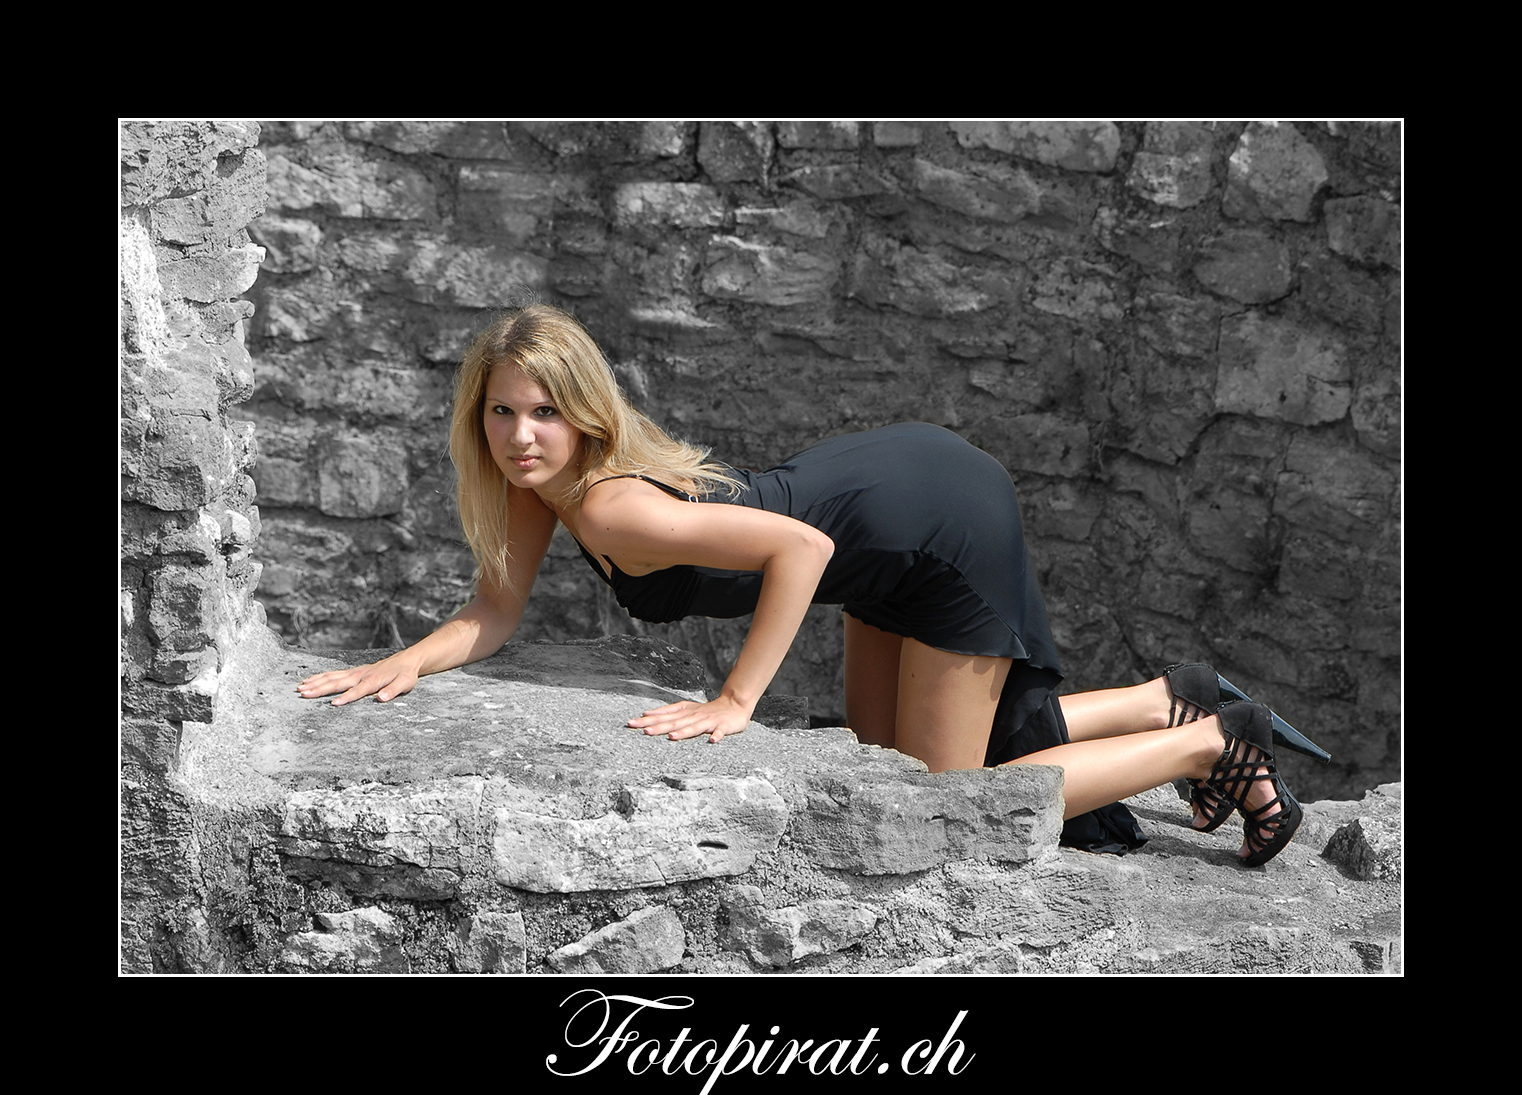 Fotoshooting, outdoor, Modelagentur, sexy Model, Fitnessmodel, Ballkleid, Burg, blondes Fotomodel